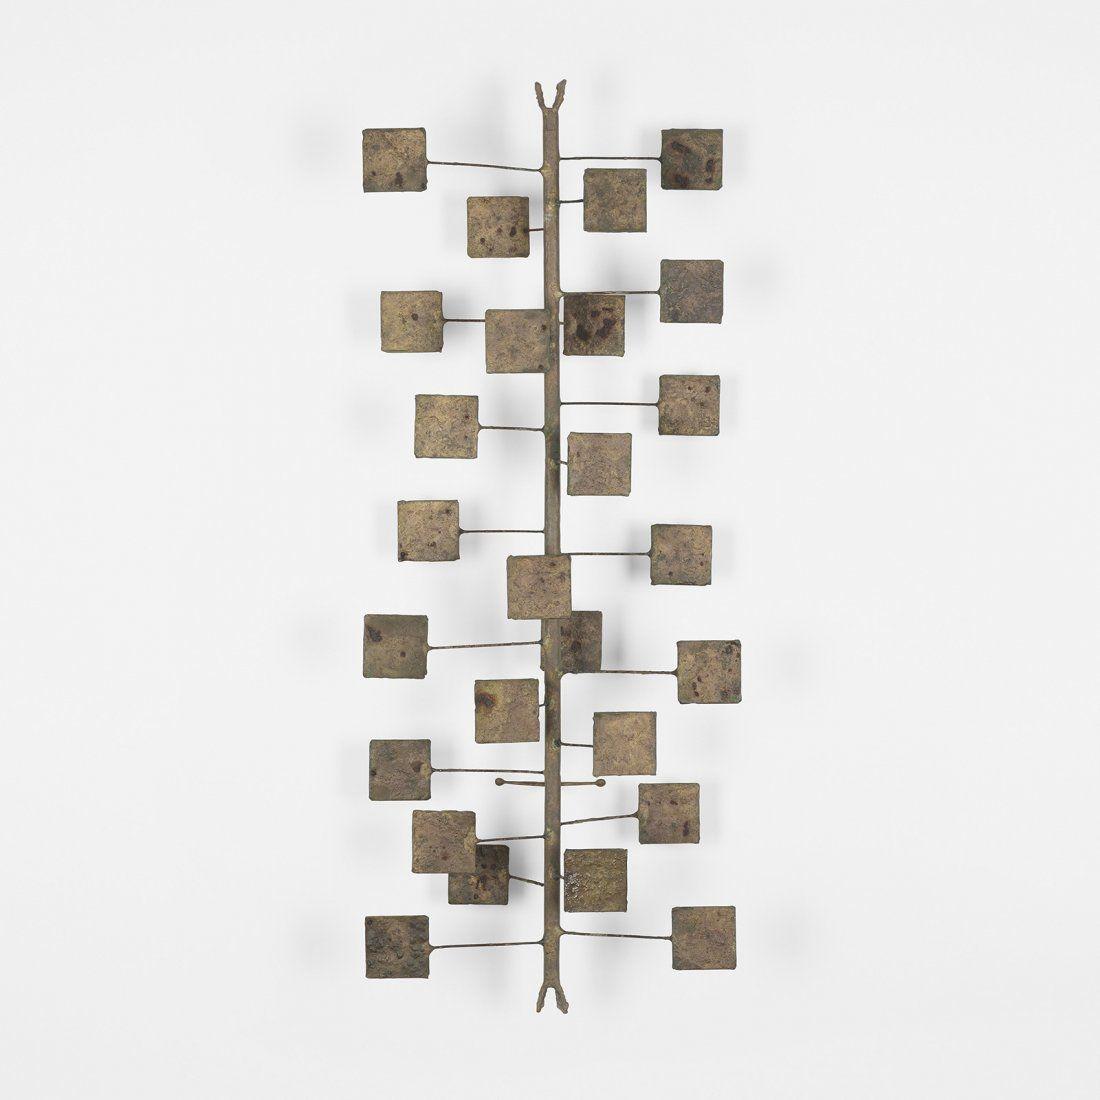 Harry Bertoia Untitled (Multi-Plane Construction)